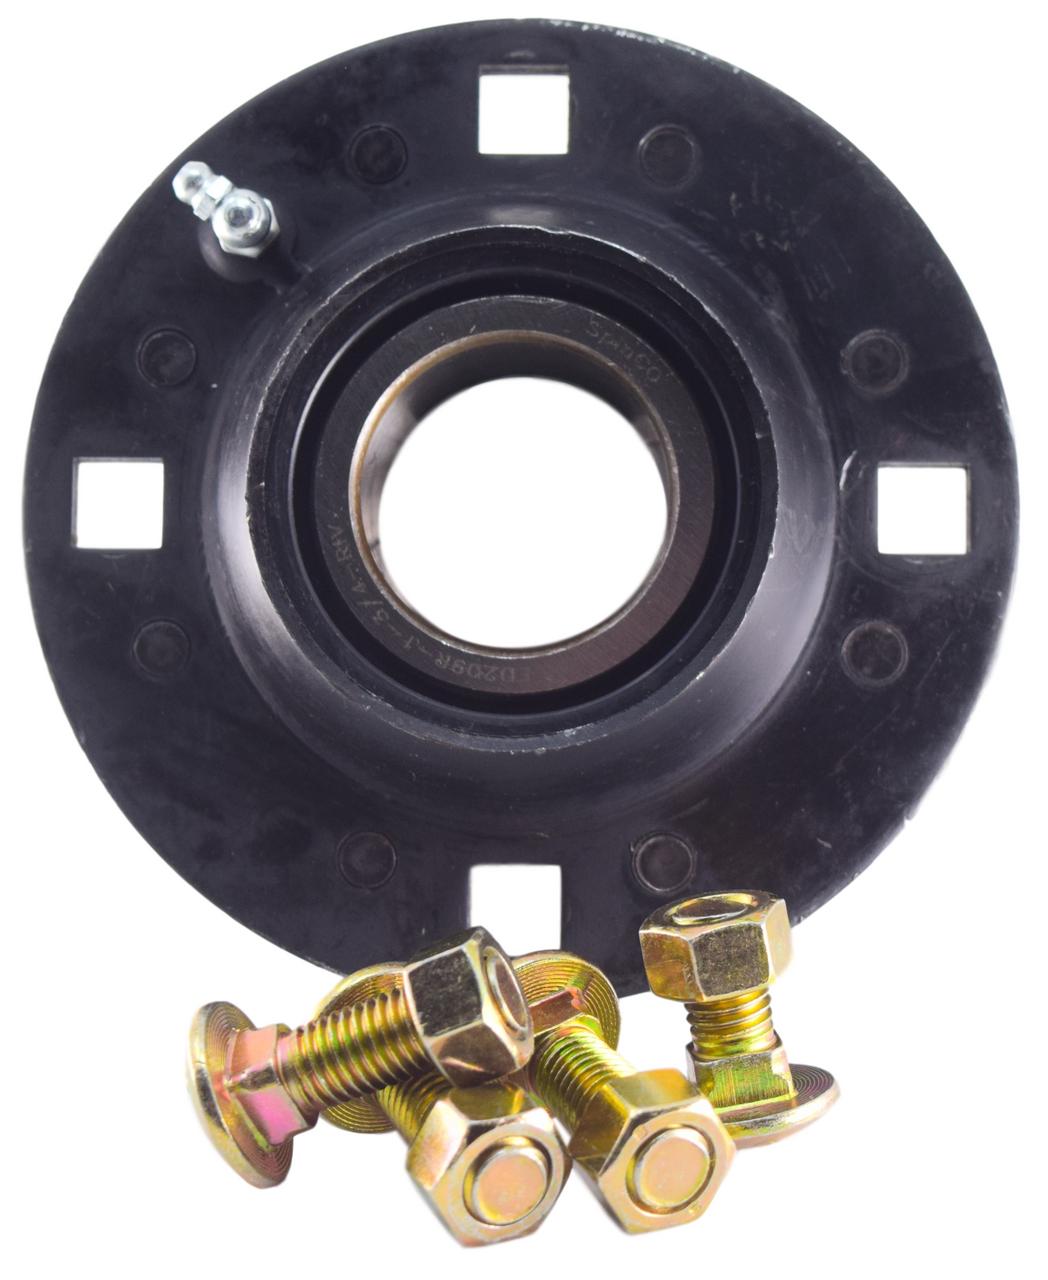 "1-3/4"" Riveted John Deere Disc Harrow Bearing Kit AA30941 Image"